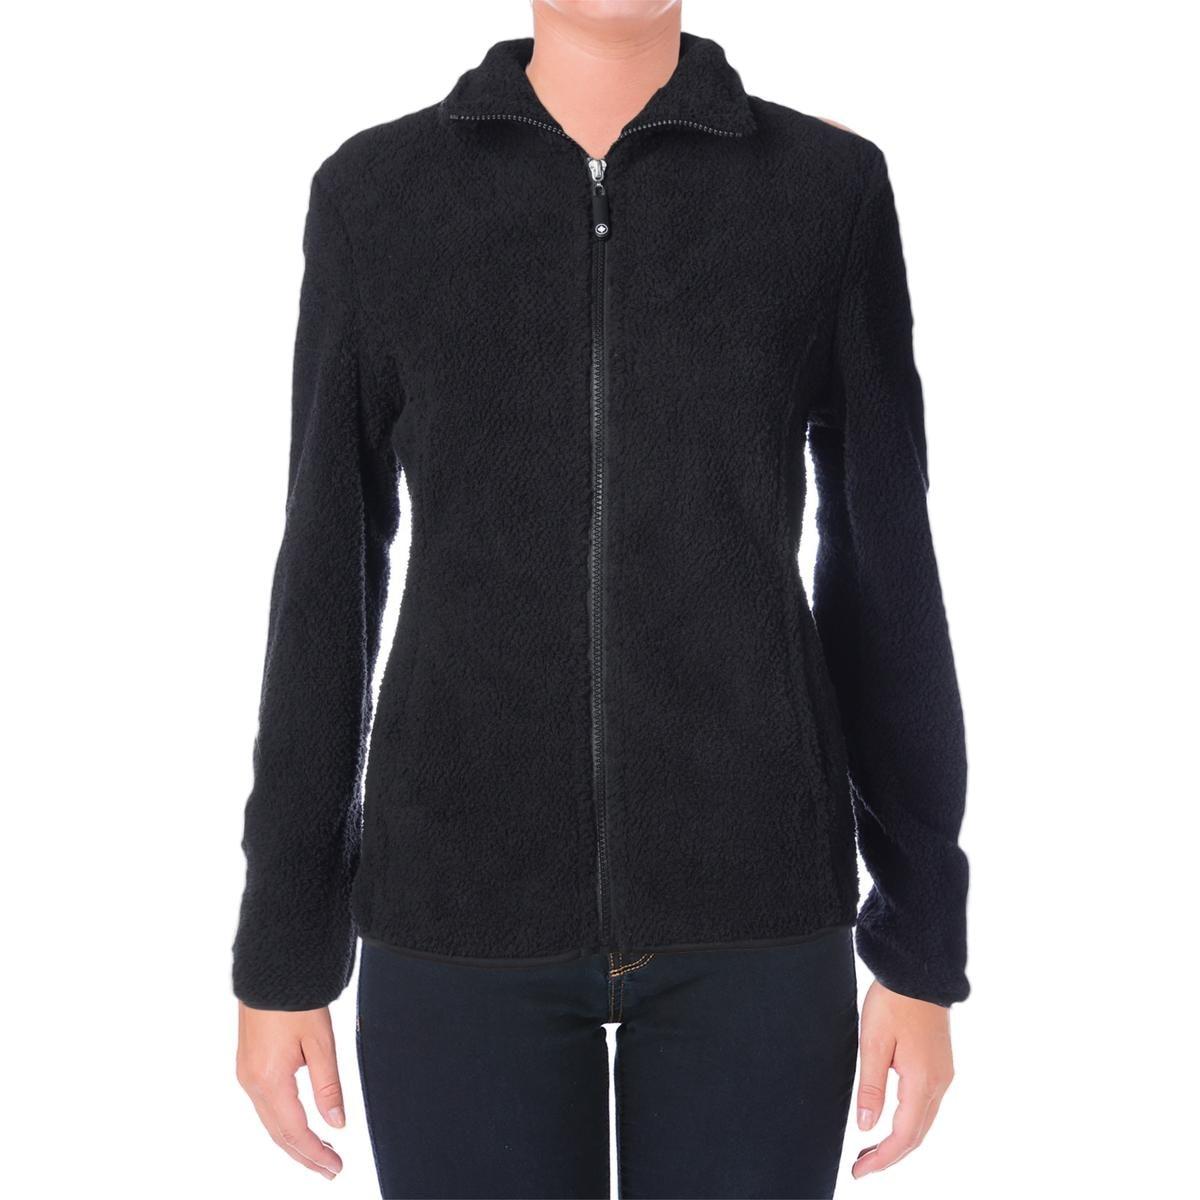 Halifax Womens Jacket Fleece Zip Front - Thumbnail 0